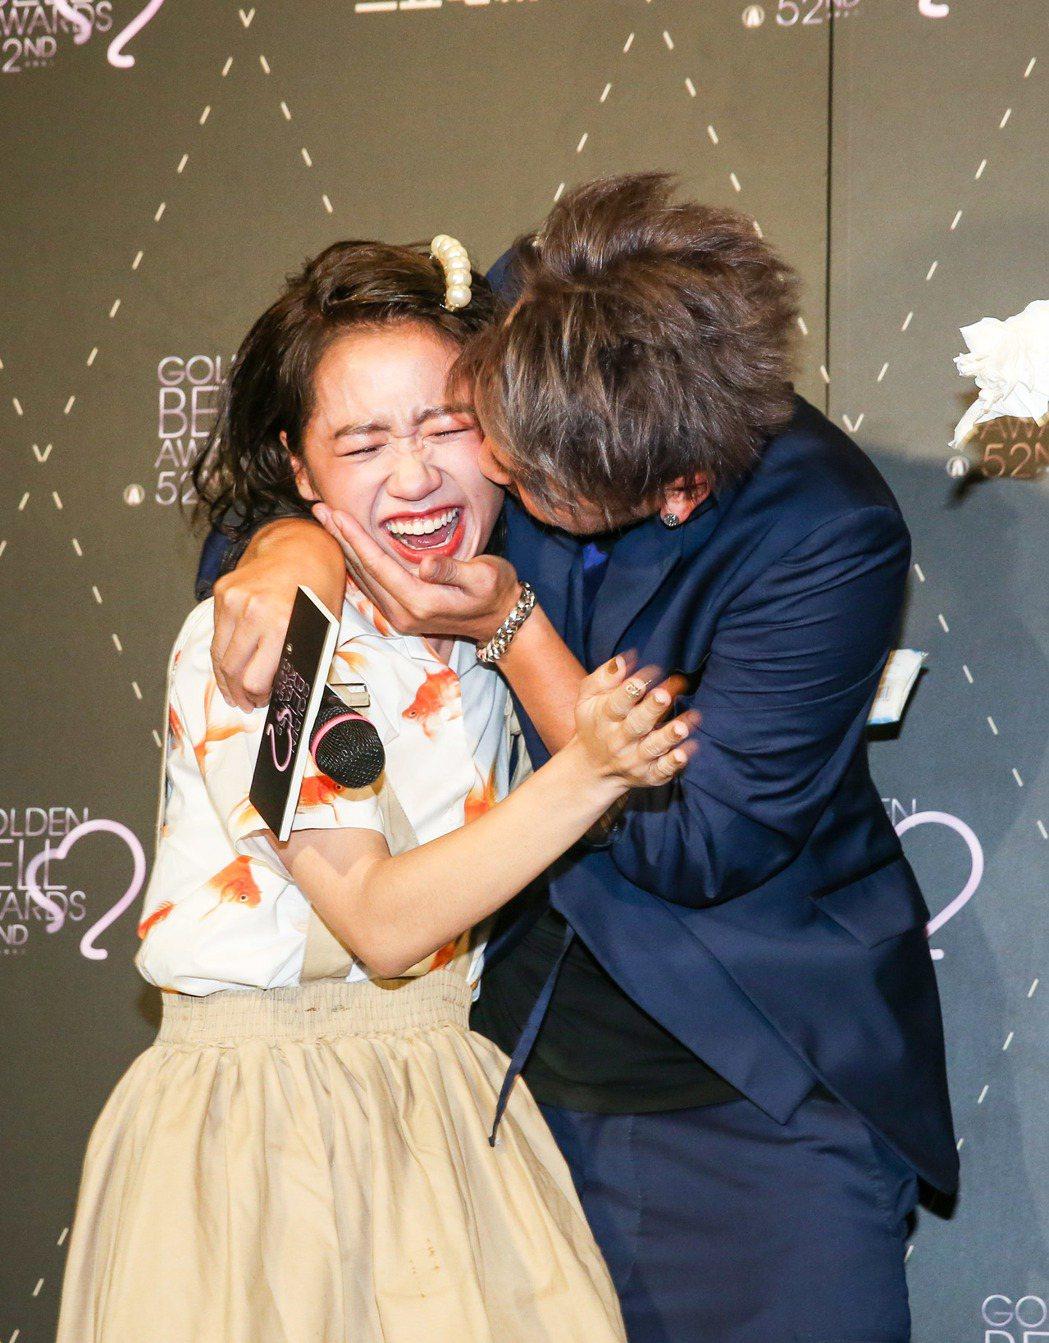 KID林柏昇(右)送給Lulu(左)一個安慰之吻。記者鄭清元/攝影